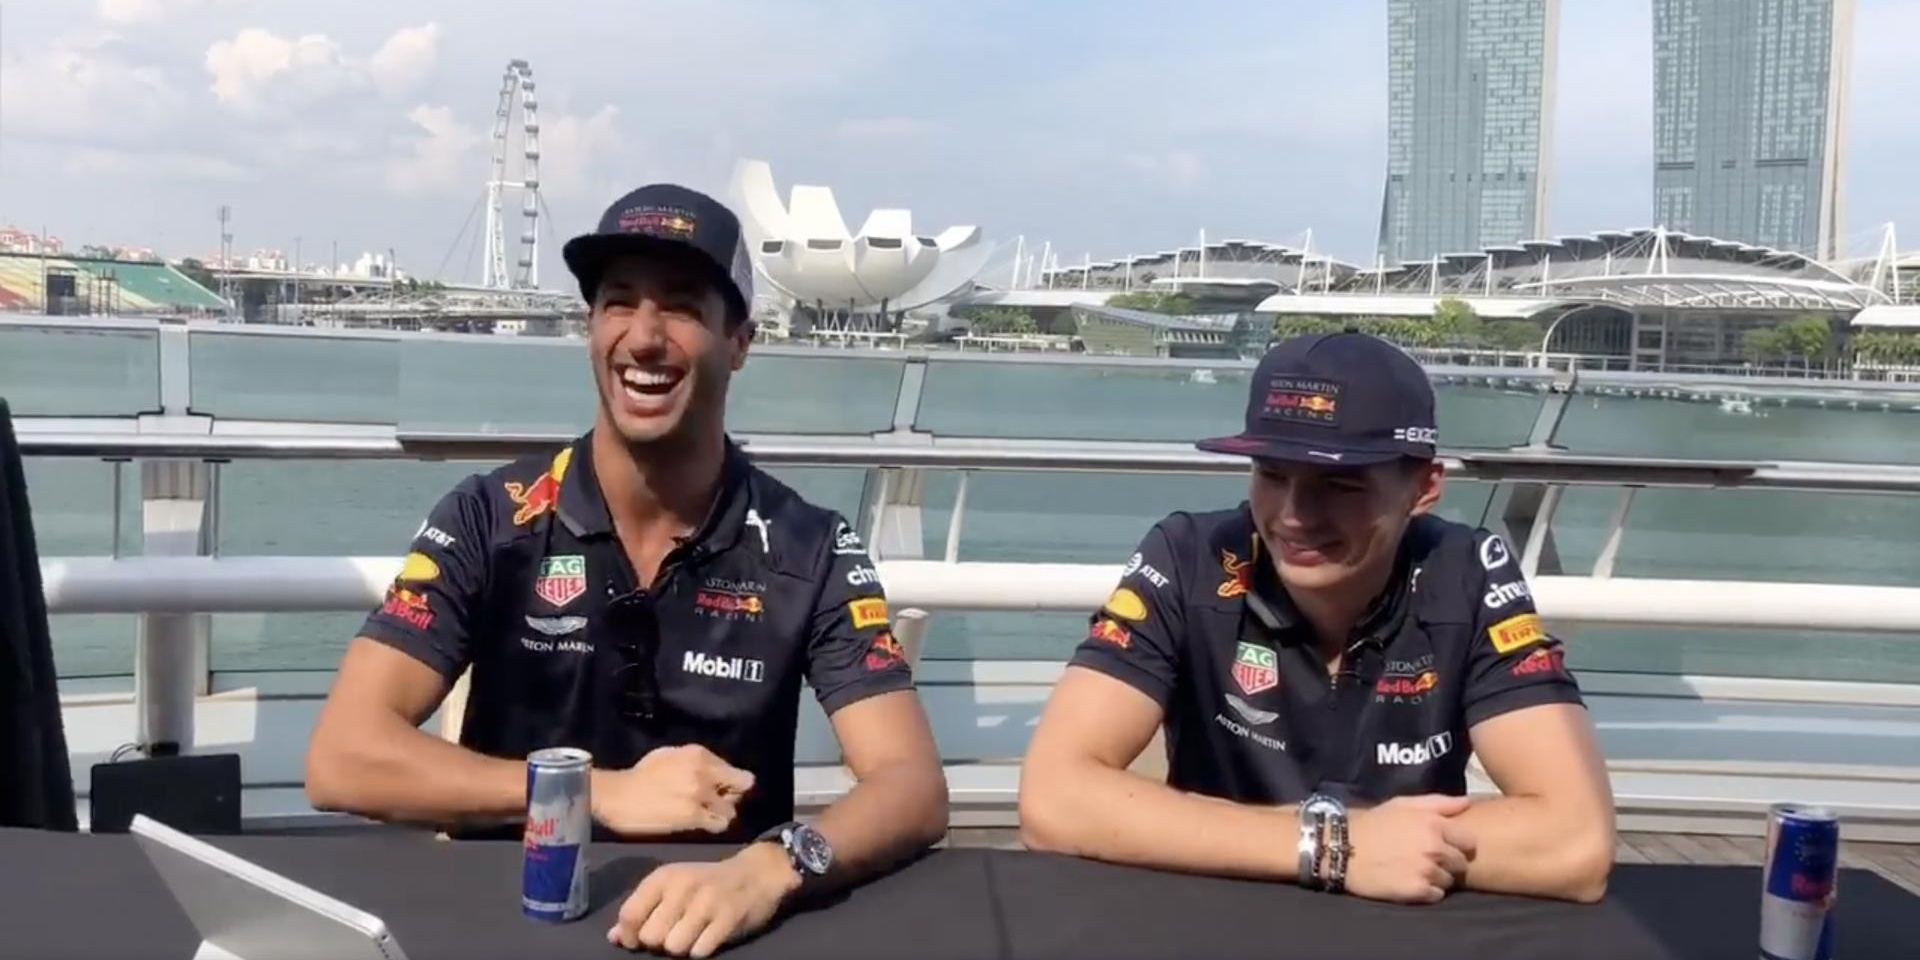 Red Bull drivers react to Singaporean music